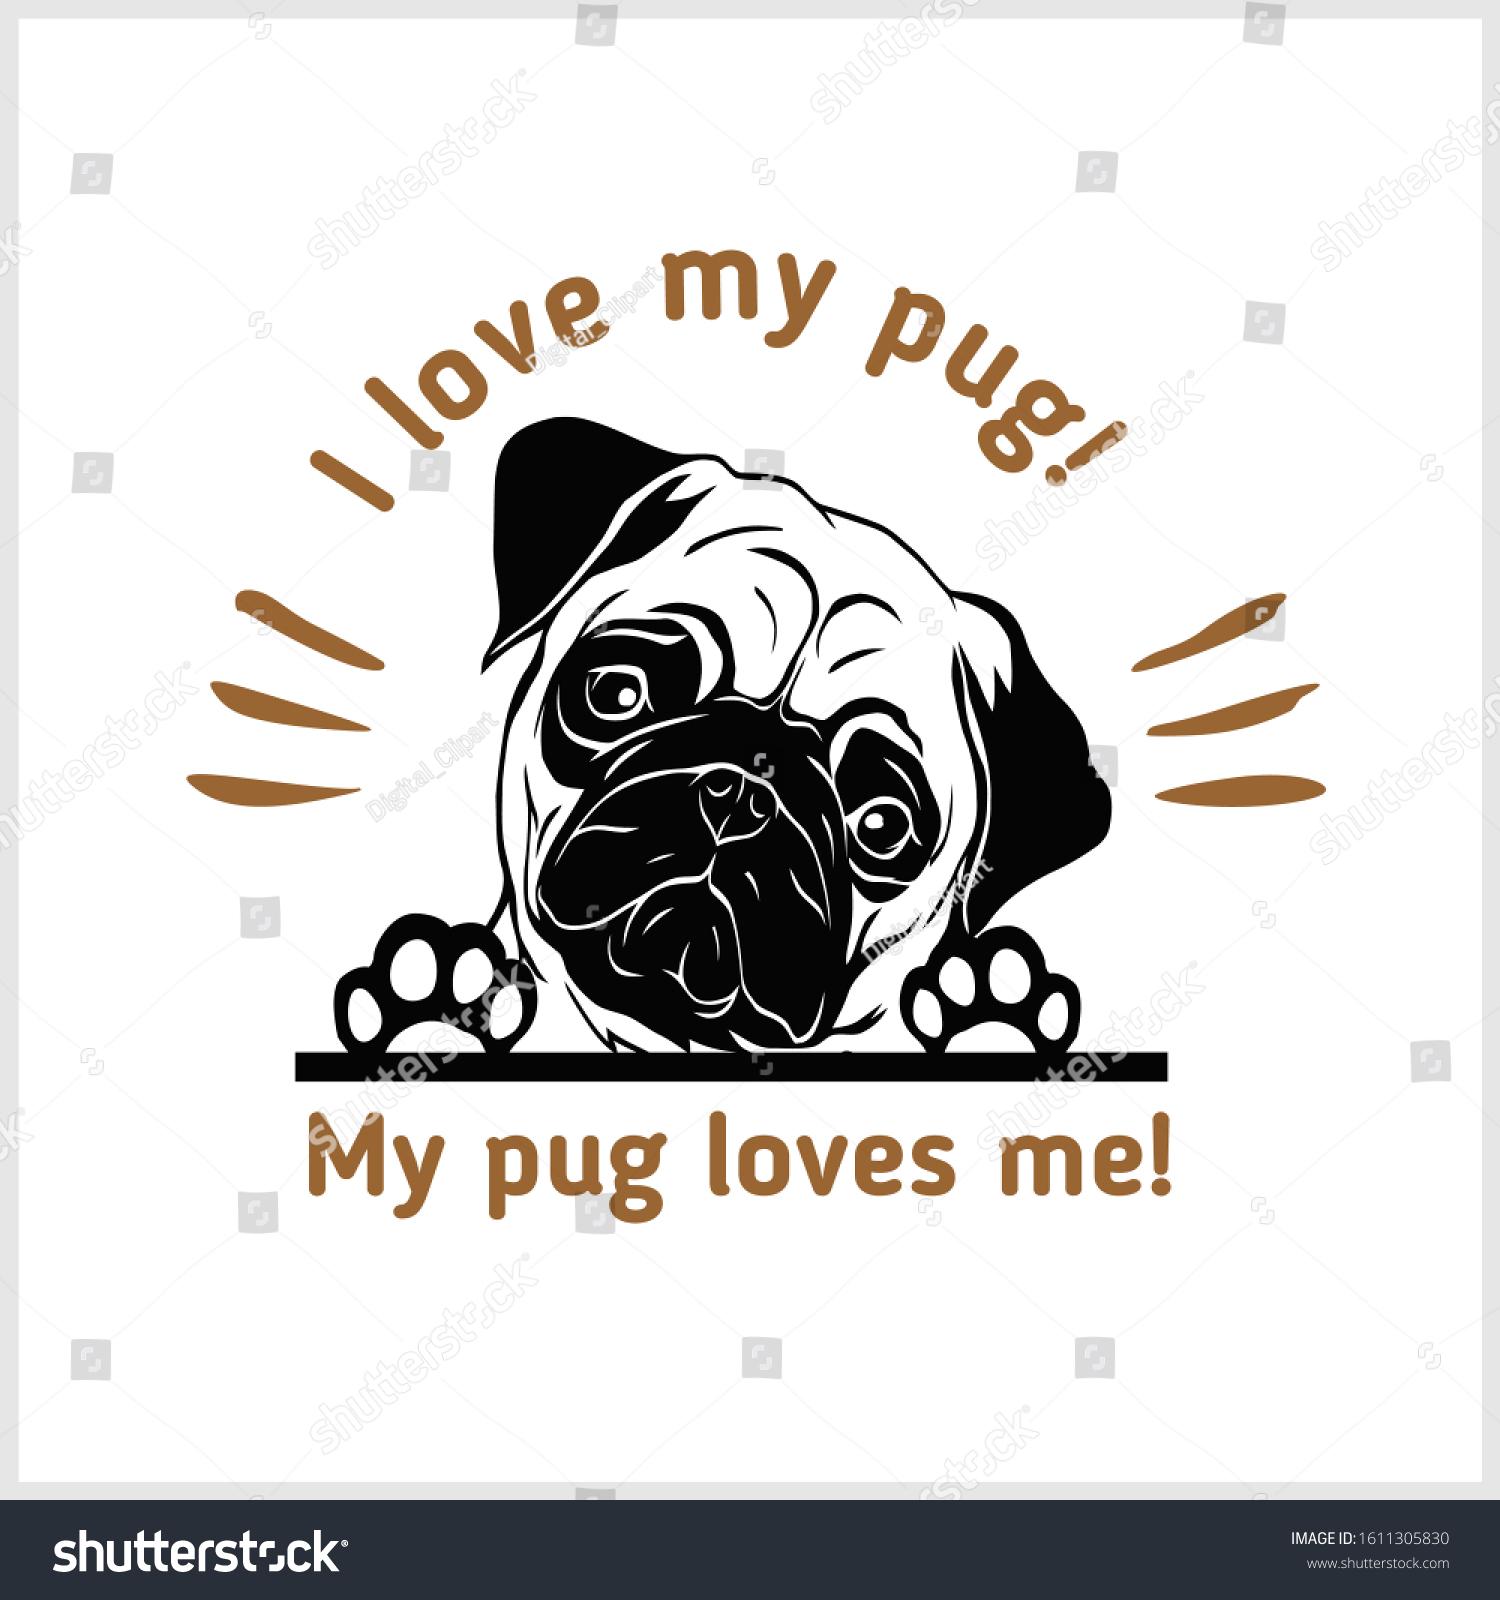 peeking pug vector illustration isolated on stock vector royalty free 1611305830 https www shutterstock com image vector peeking pug vector illustration isolated on 1611305830